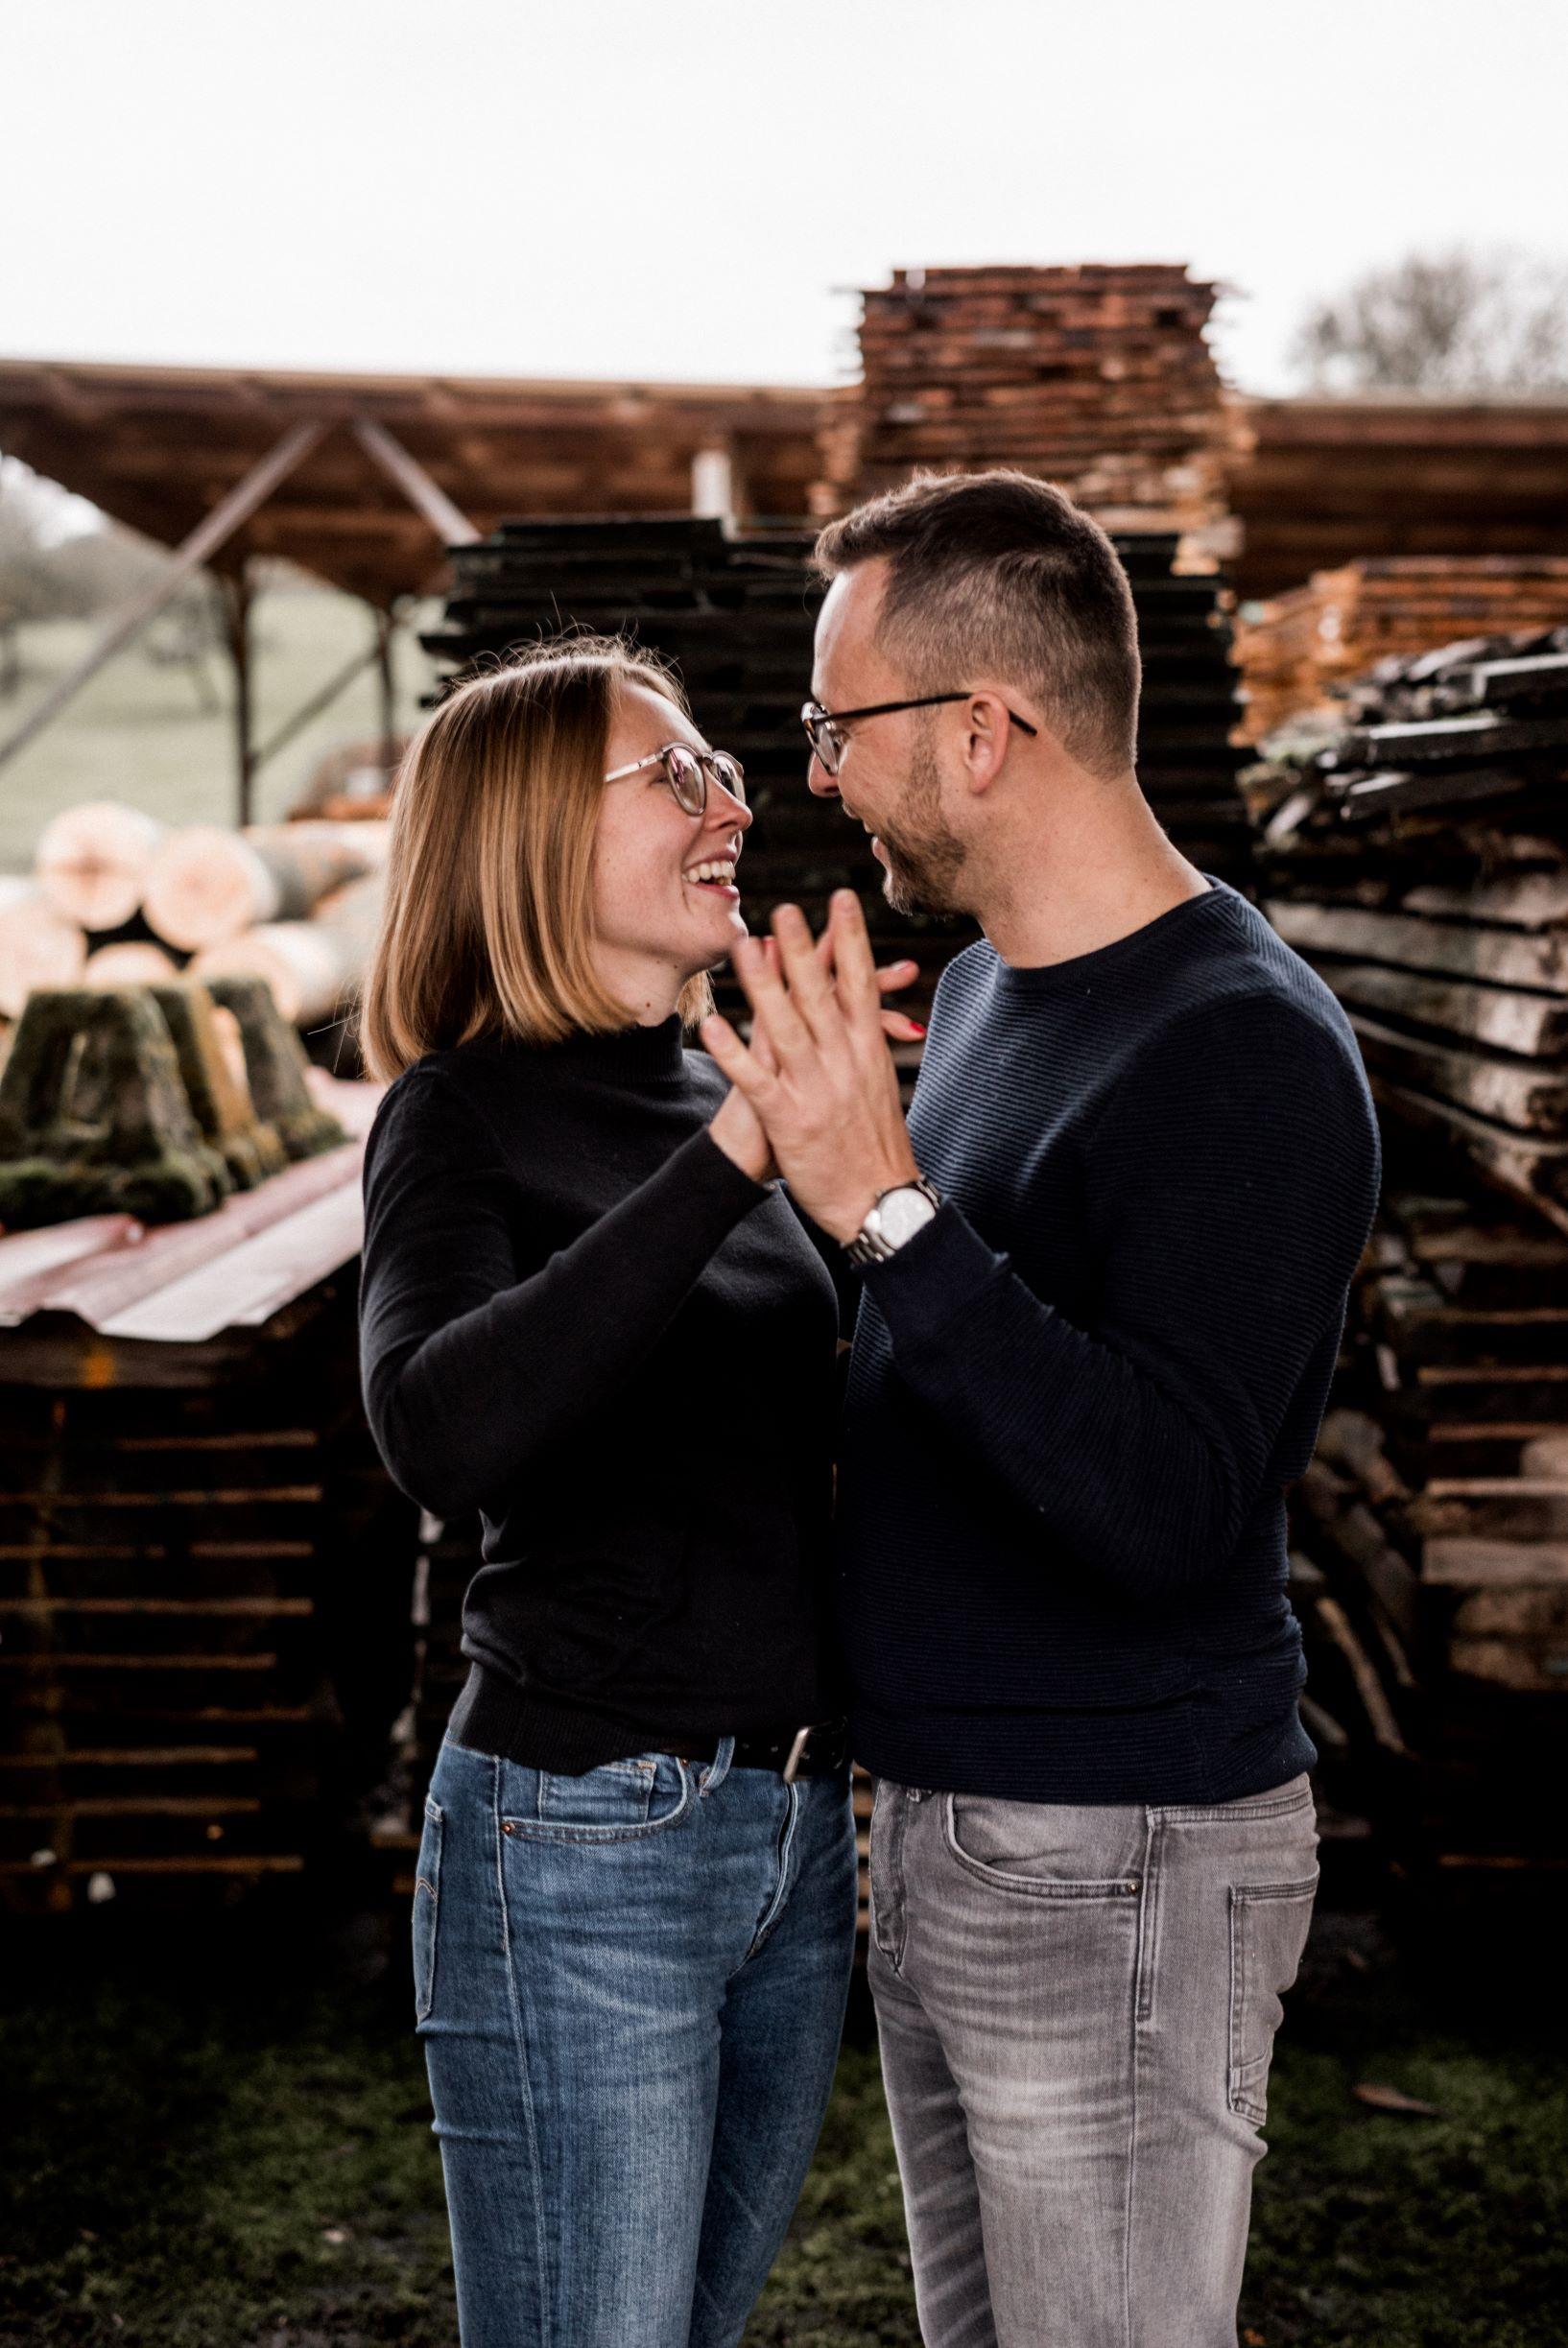 paarshooting wedding küssen westerwald tanzen liebe